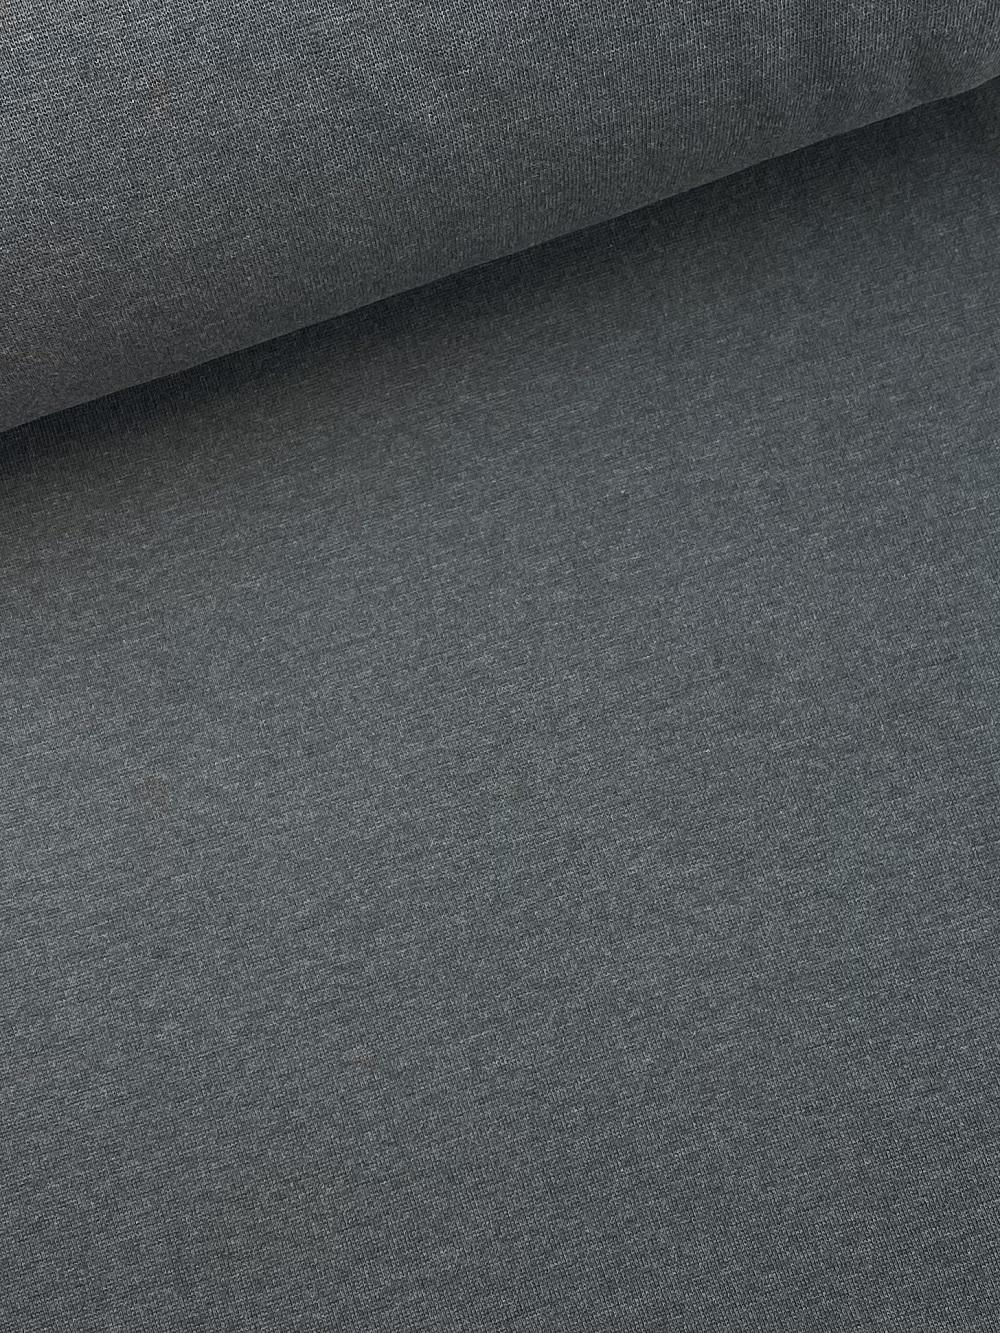 Bündchenware (glatt), dunkel grau. Art. SW10627